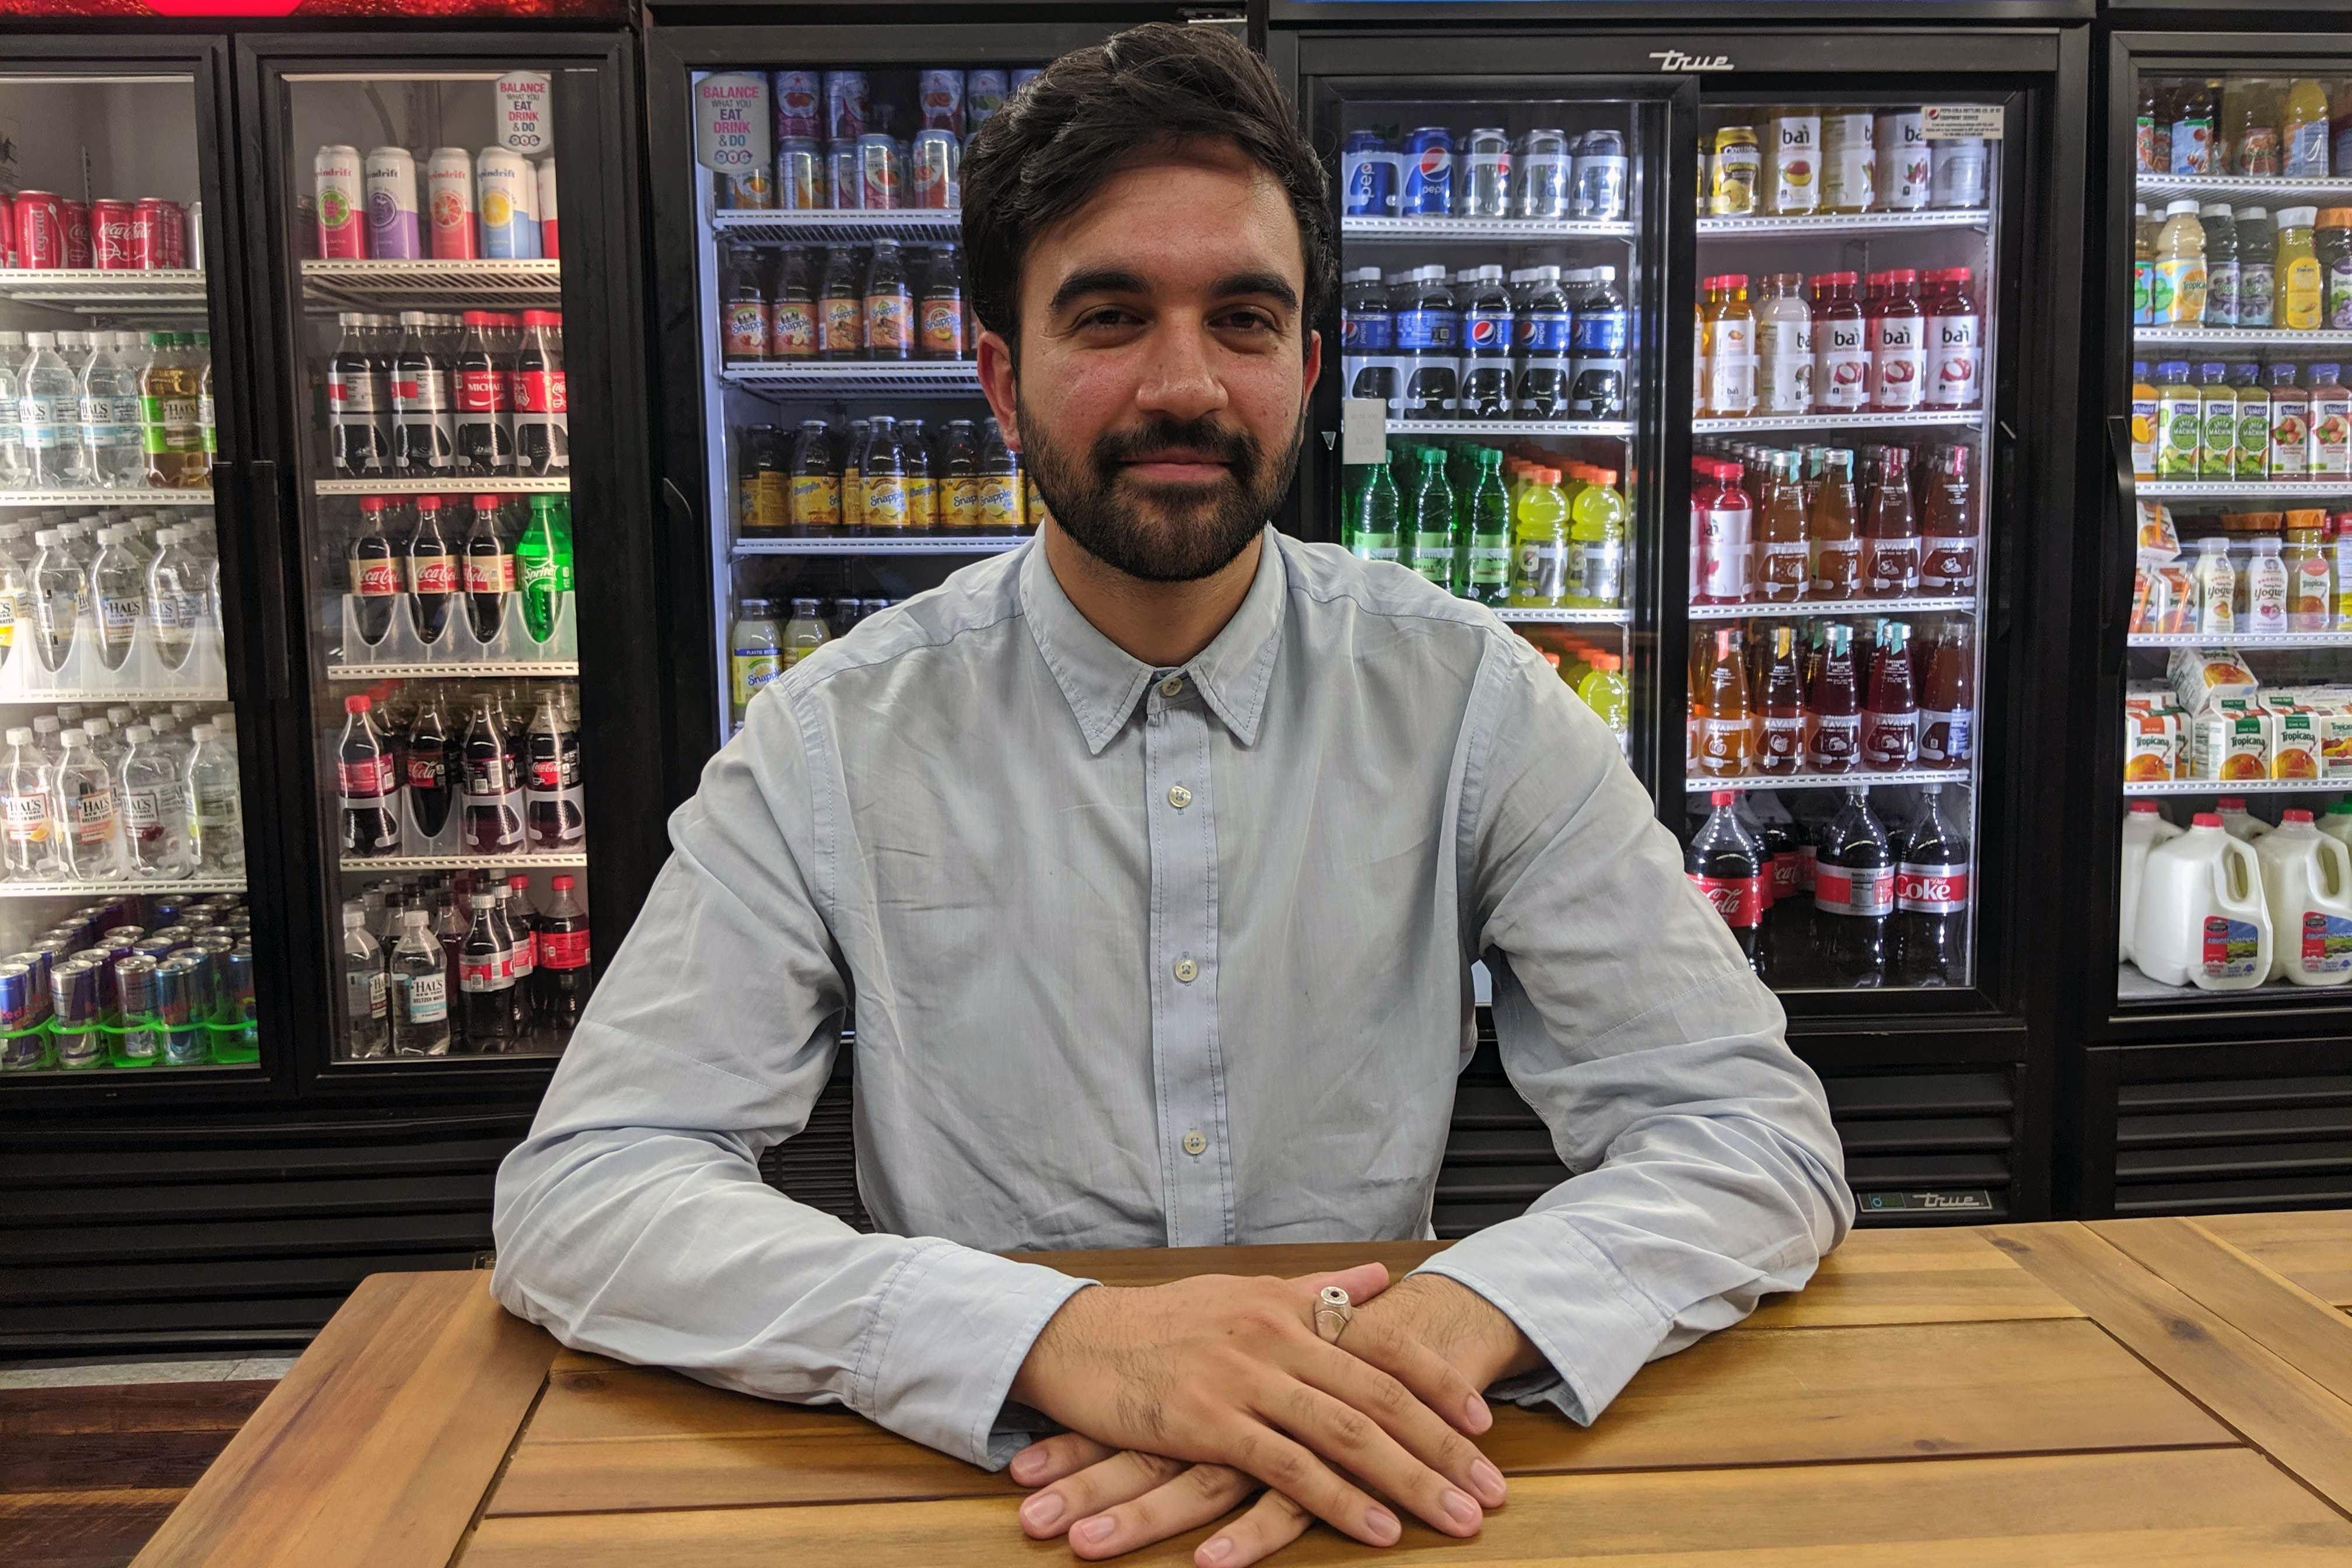 Zohran Mamdani talks to THE CITY in a Jackson Heights deli.